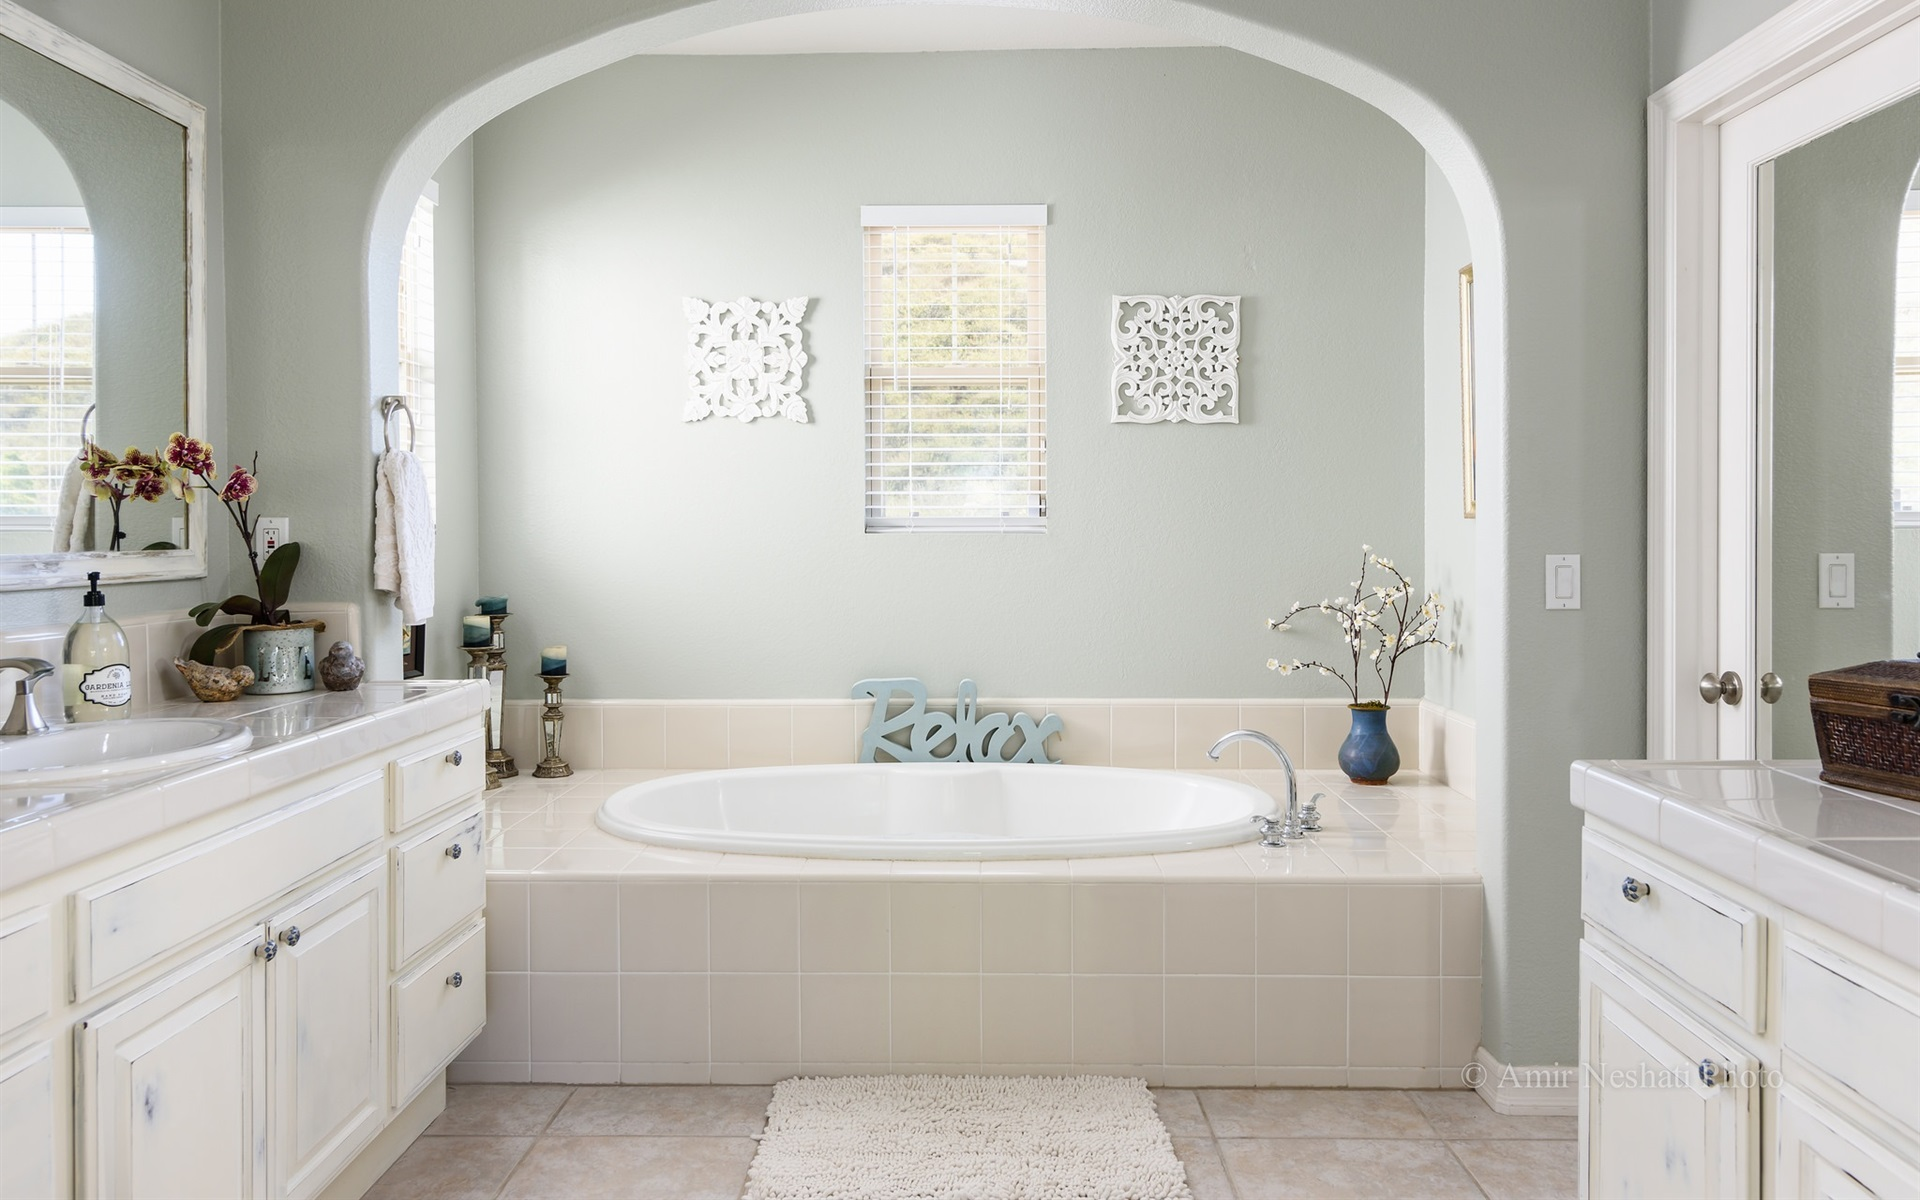 Fondos de pantalla Cuarto de baño, estilo blanco 1920x1200 ...